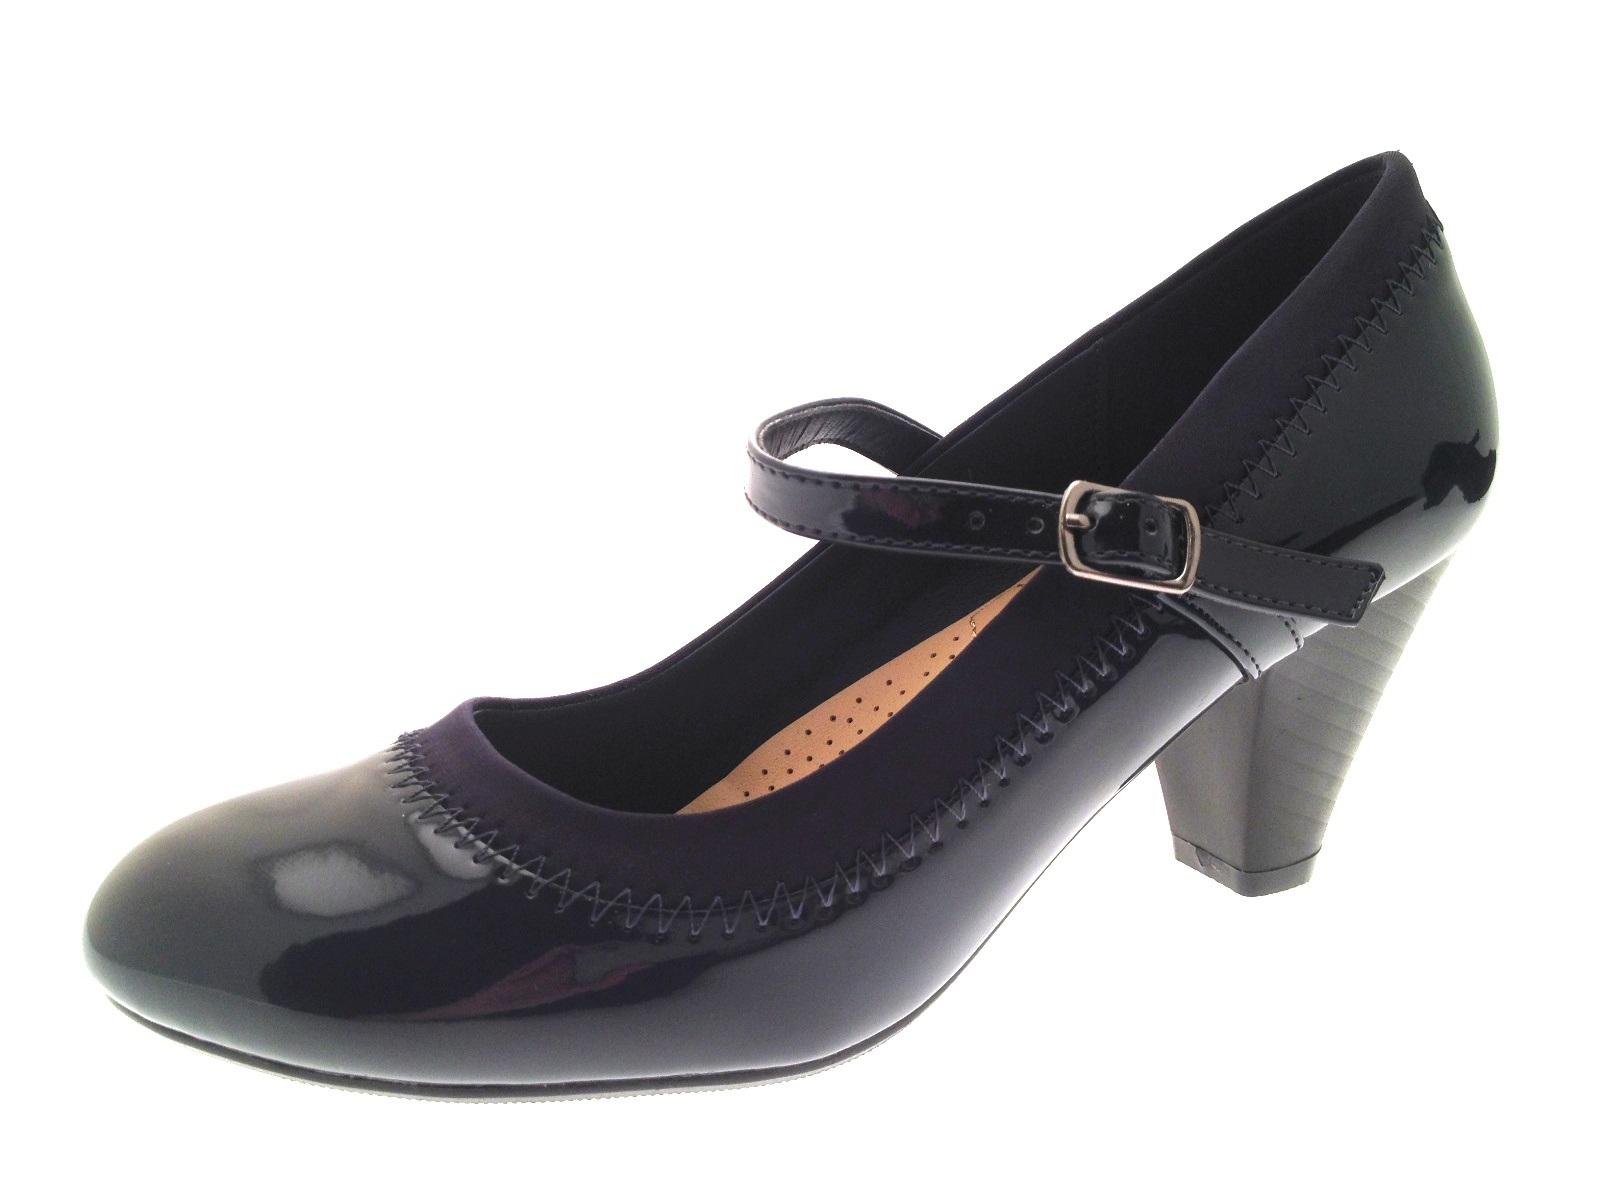 Low Heel Mary Jane Dress Shoes